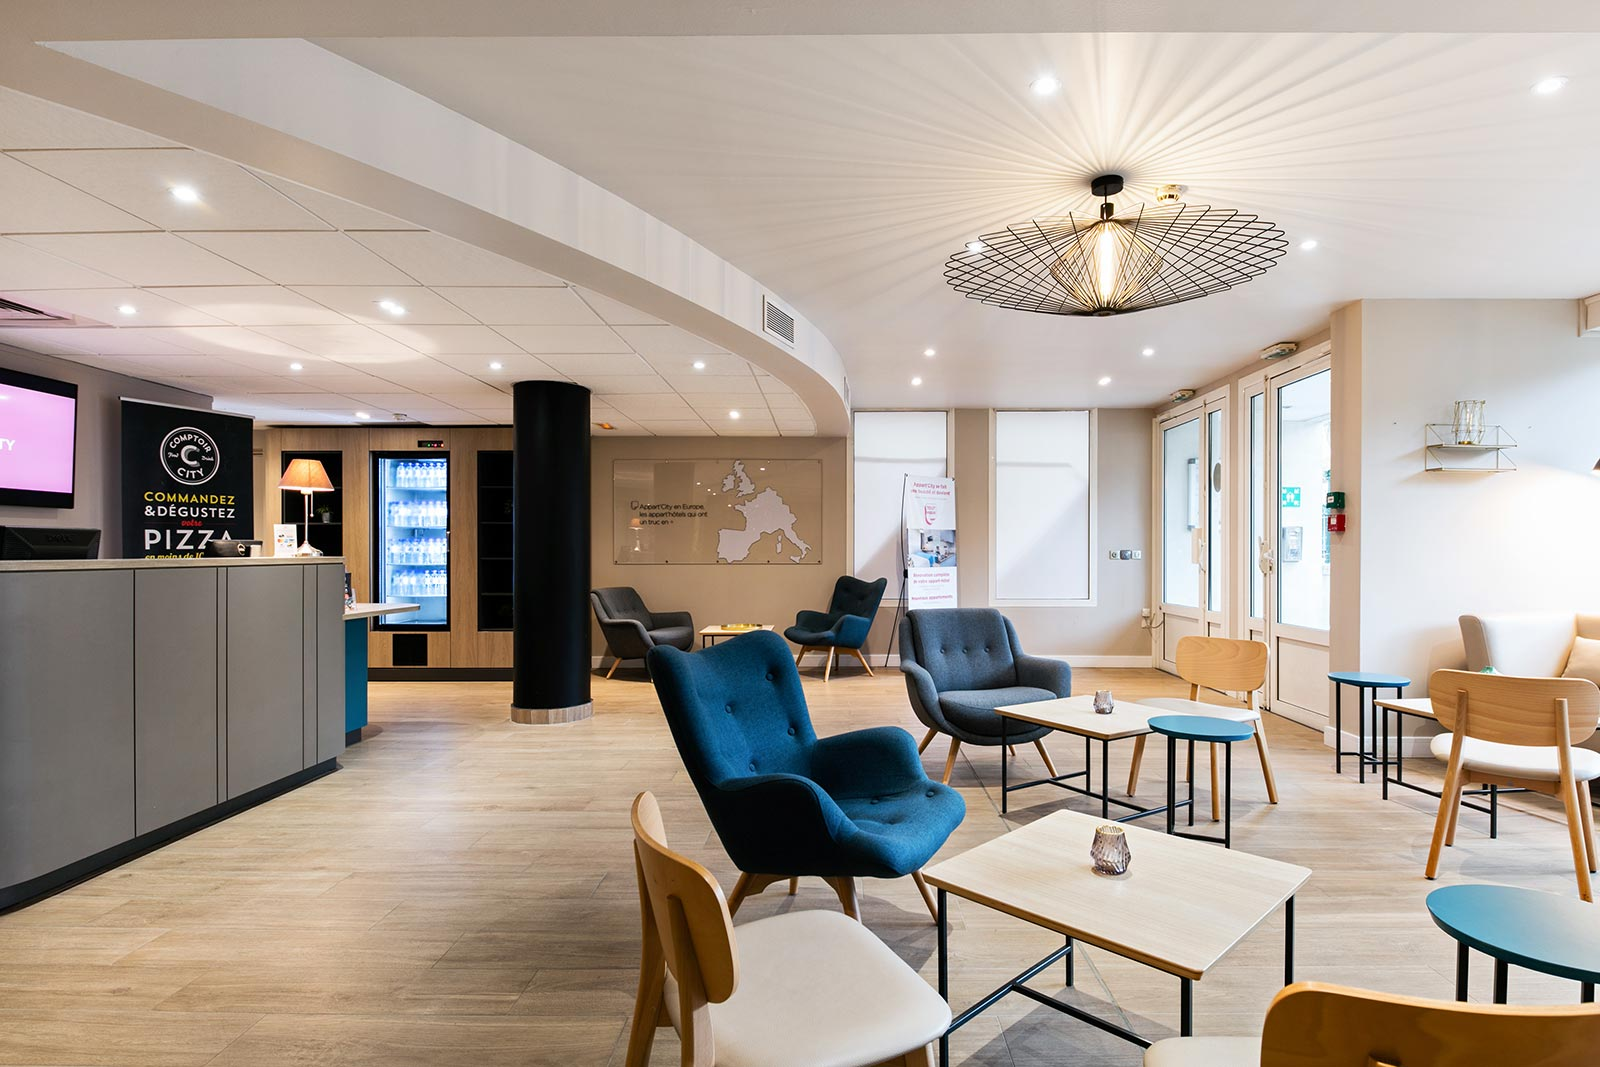 Communs-Réception-Lobby-MTPL-Montpeller-Gare-St-Roch-09.04.19_V2-(8)